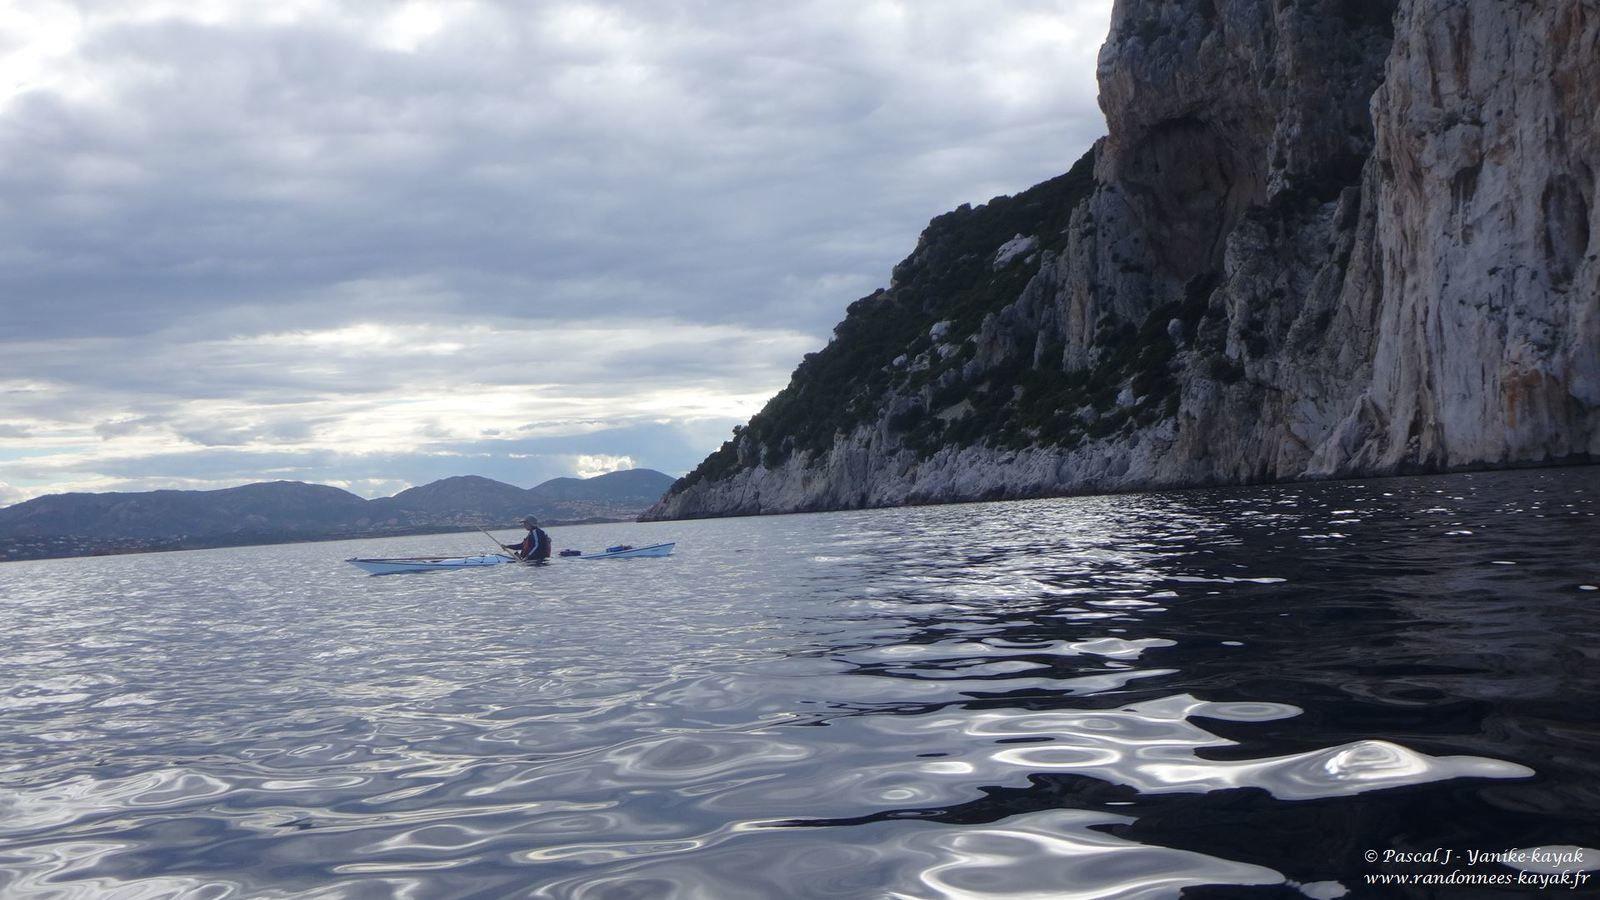 Sardegna 2019, una nuova avventura - Chapitre 9 - La beauté des îles, Piana et Tavolara